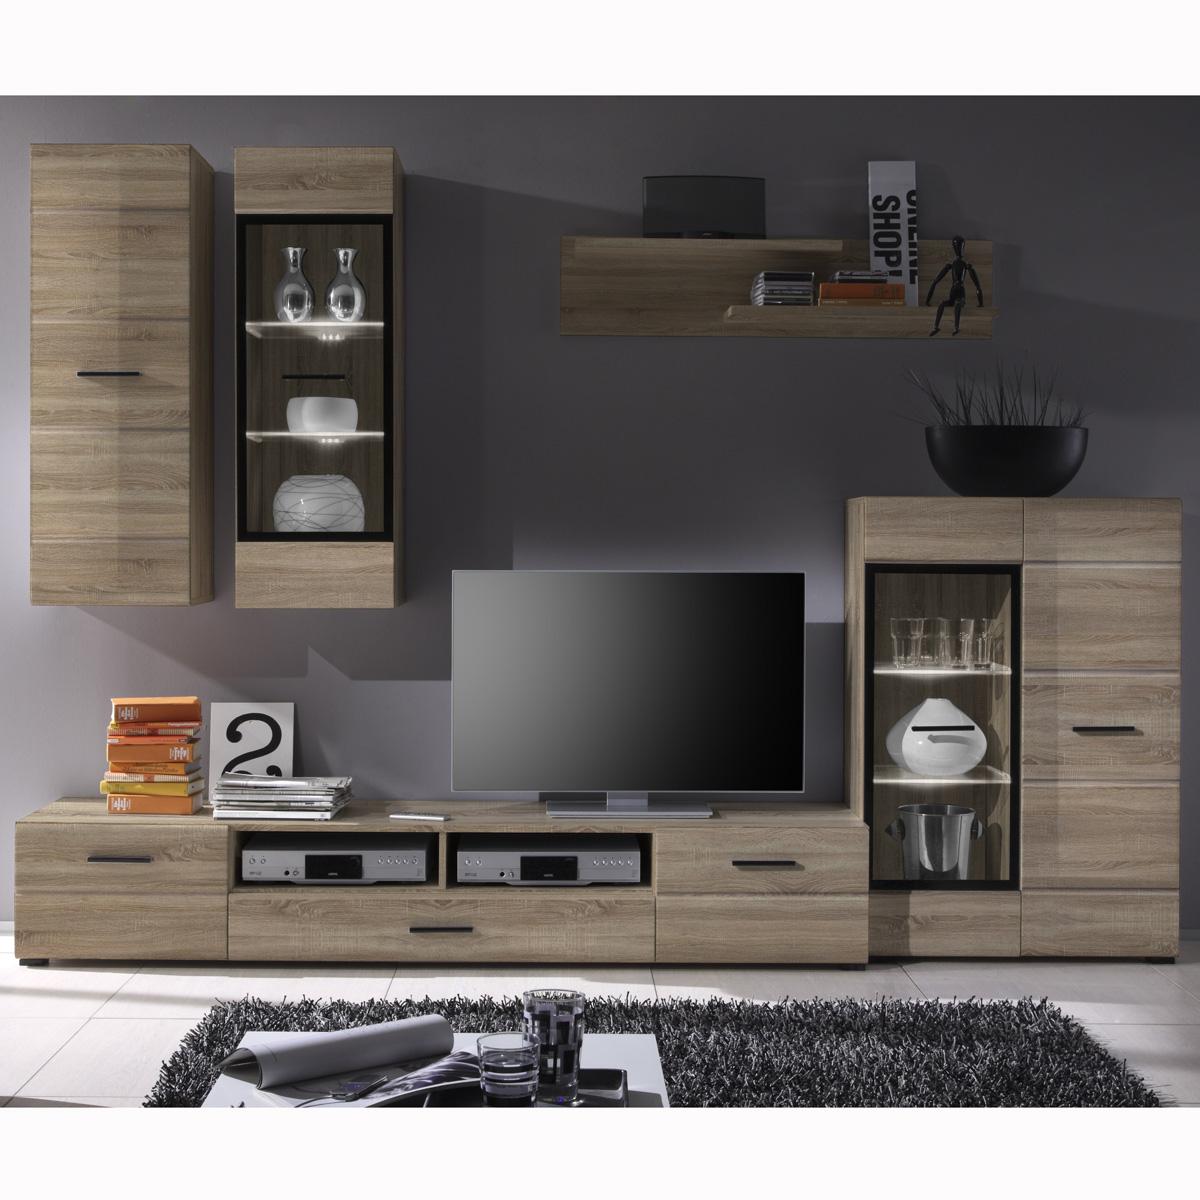 wohnwand attac anbauwand sonoma eiche inkl led neu ebay. Black Bedroom Furniture Sets. Home Design Ideas